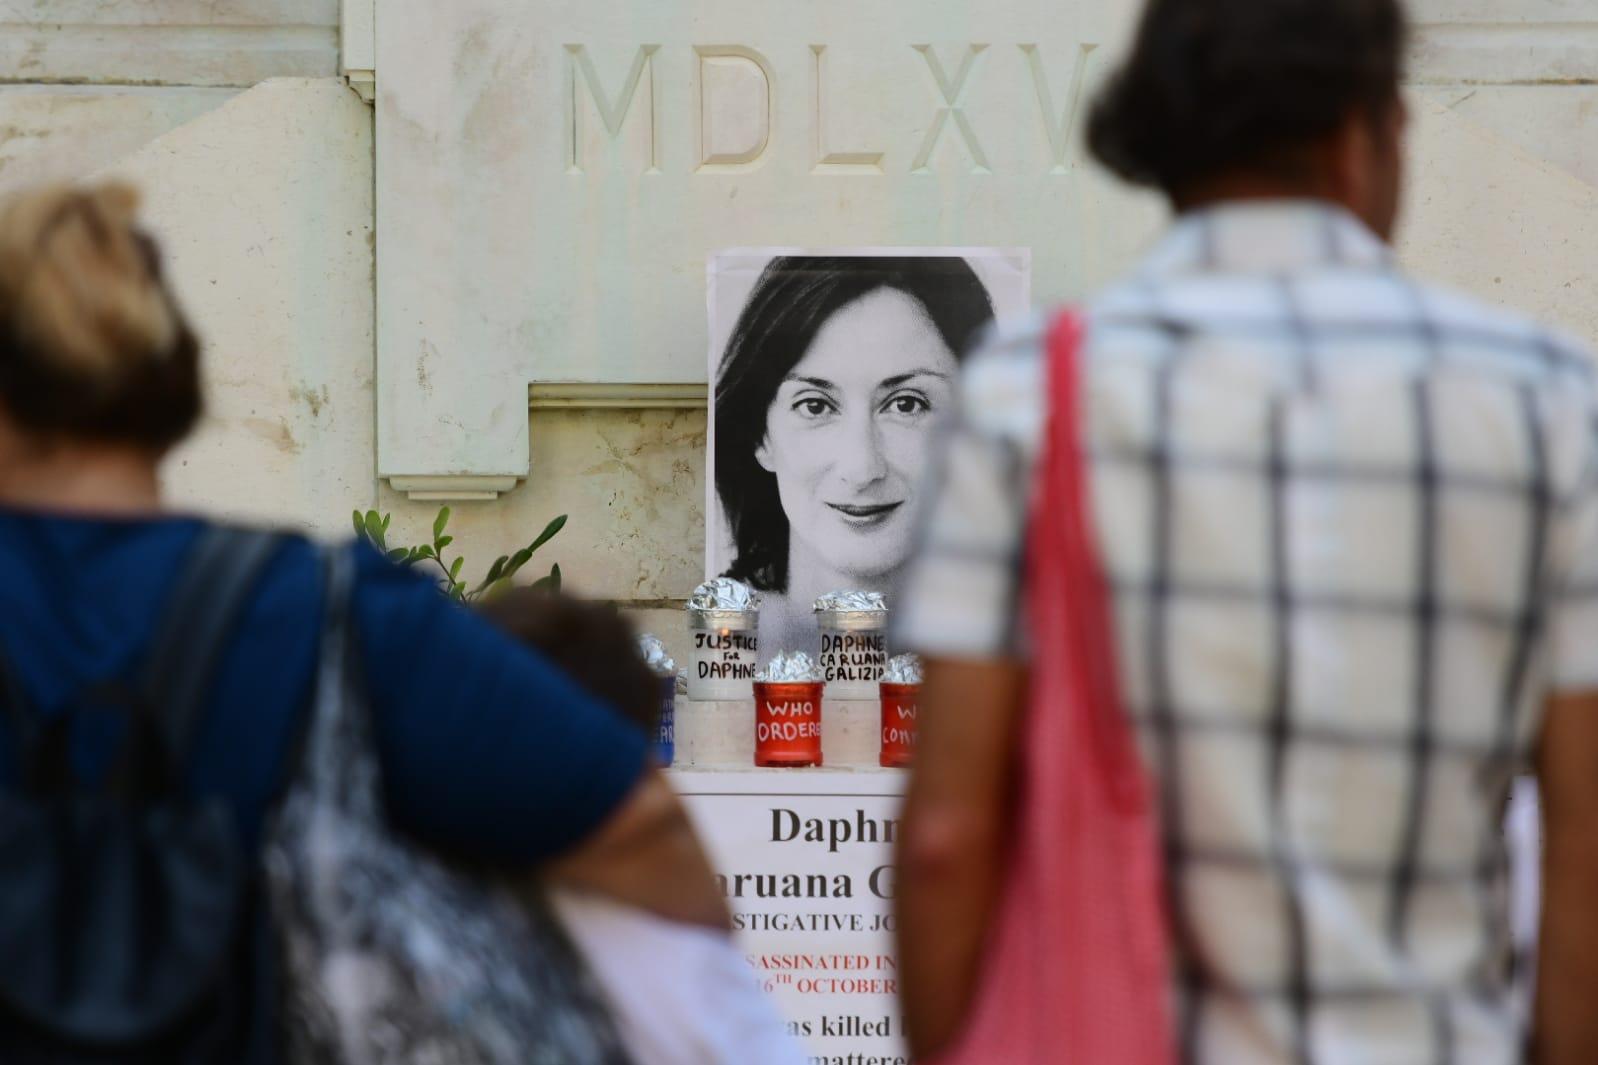 US embassy offers to help crack Caruana Galizia murder case